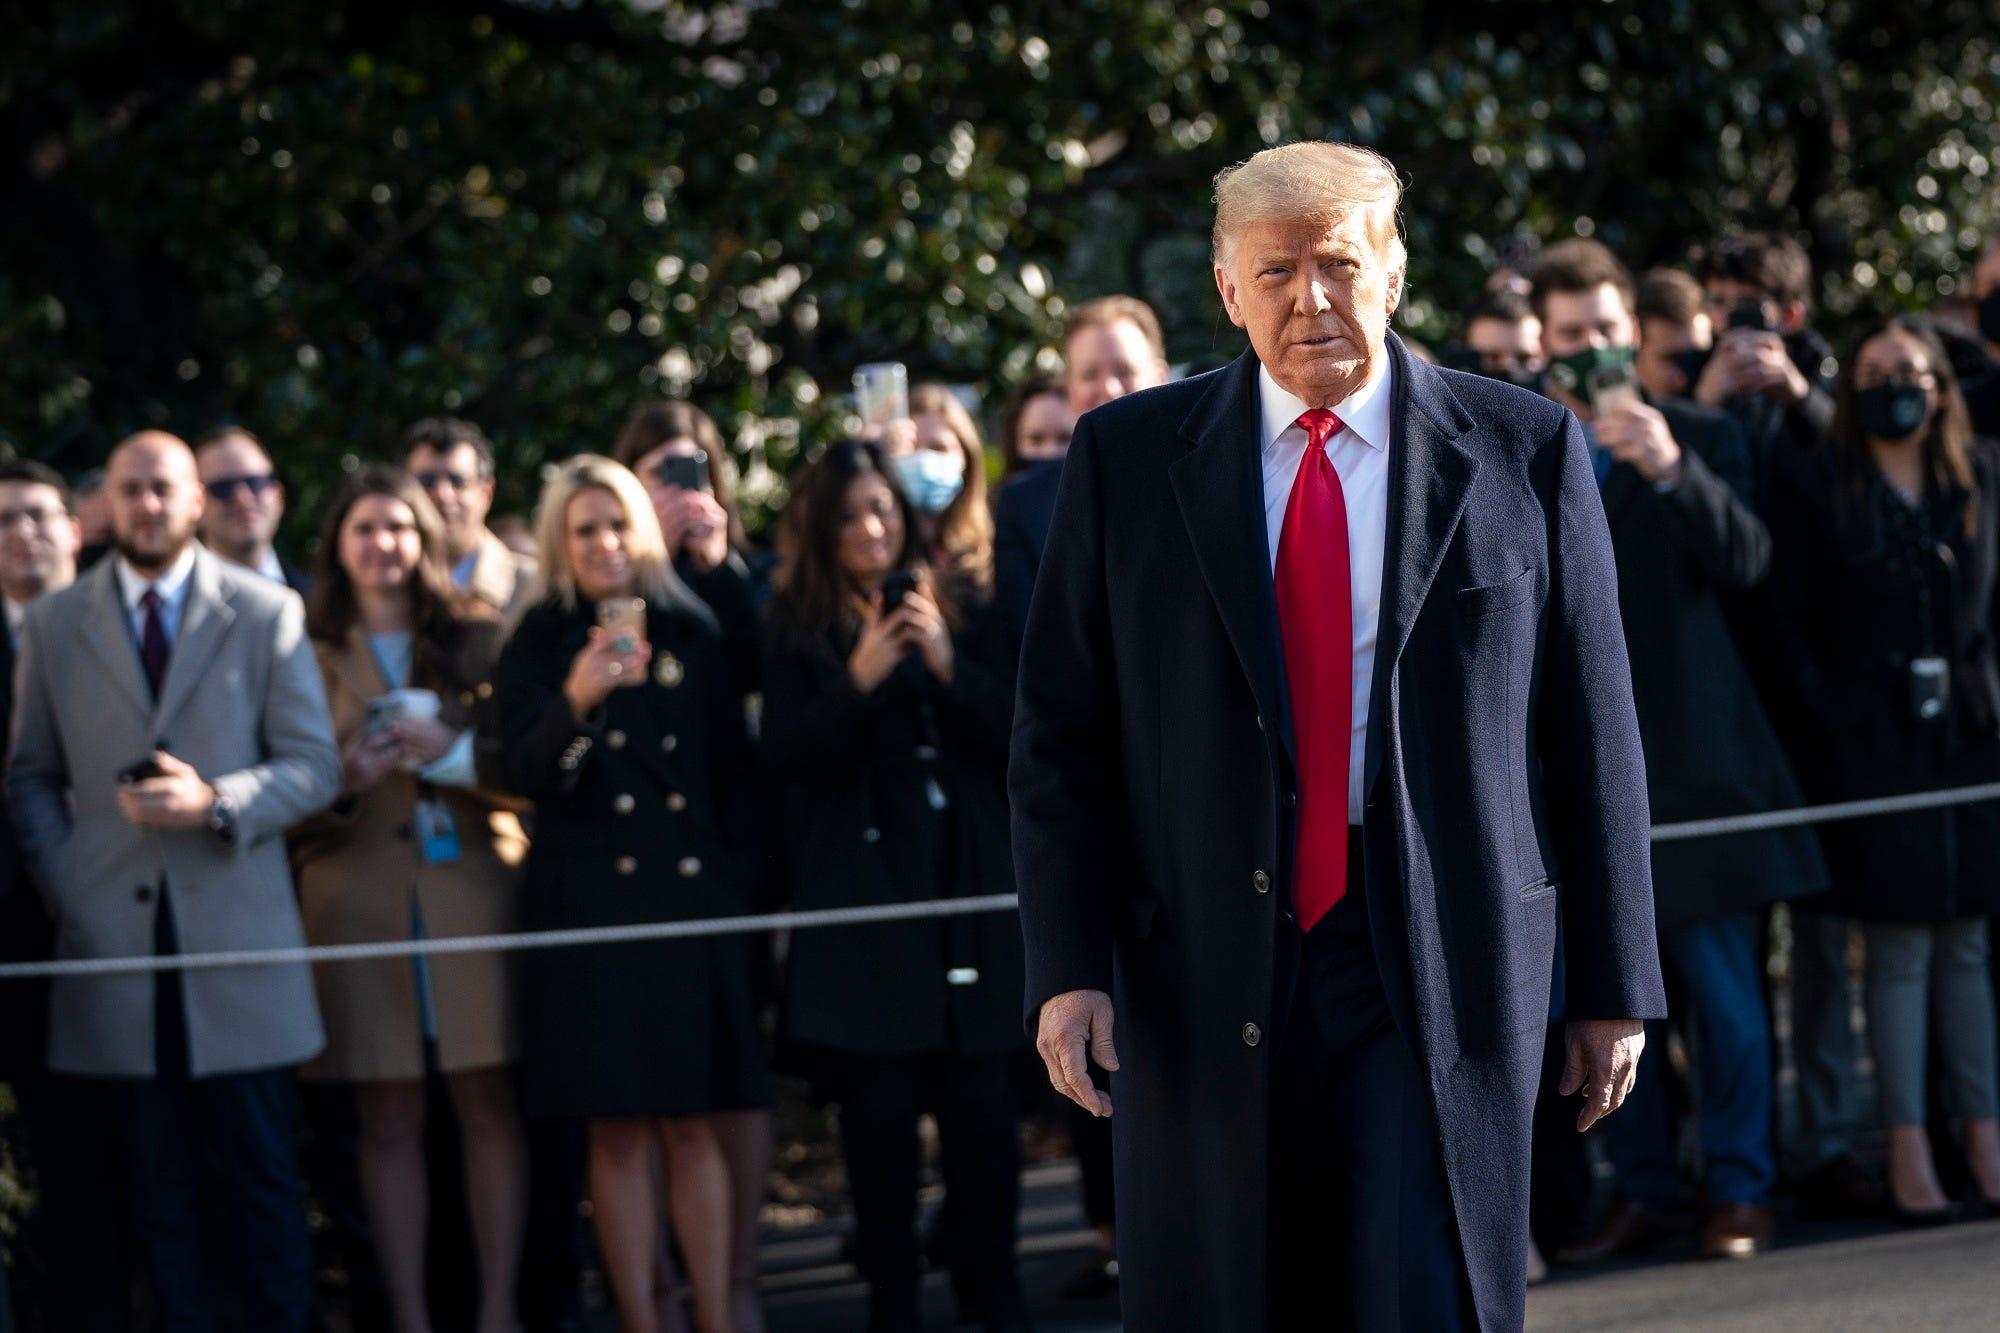 Trump acolytes craft parallel GOP universe so Trumpism lives on 2